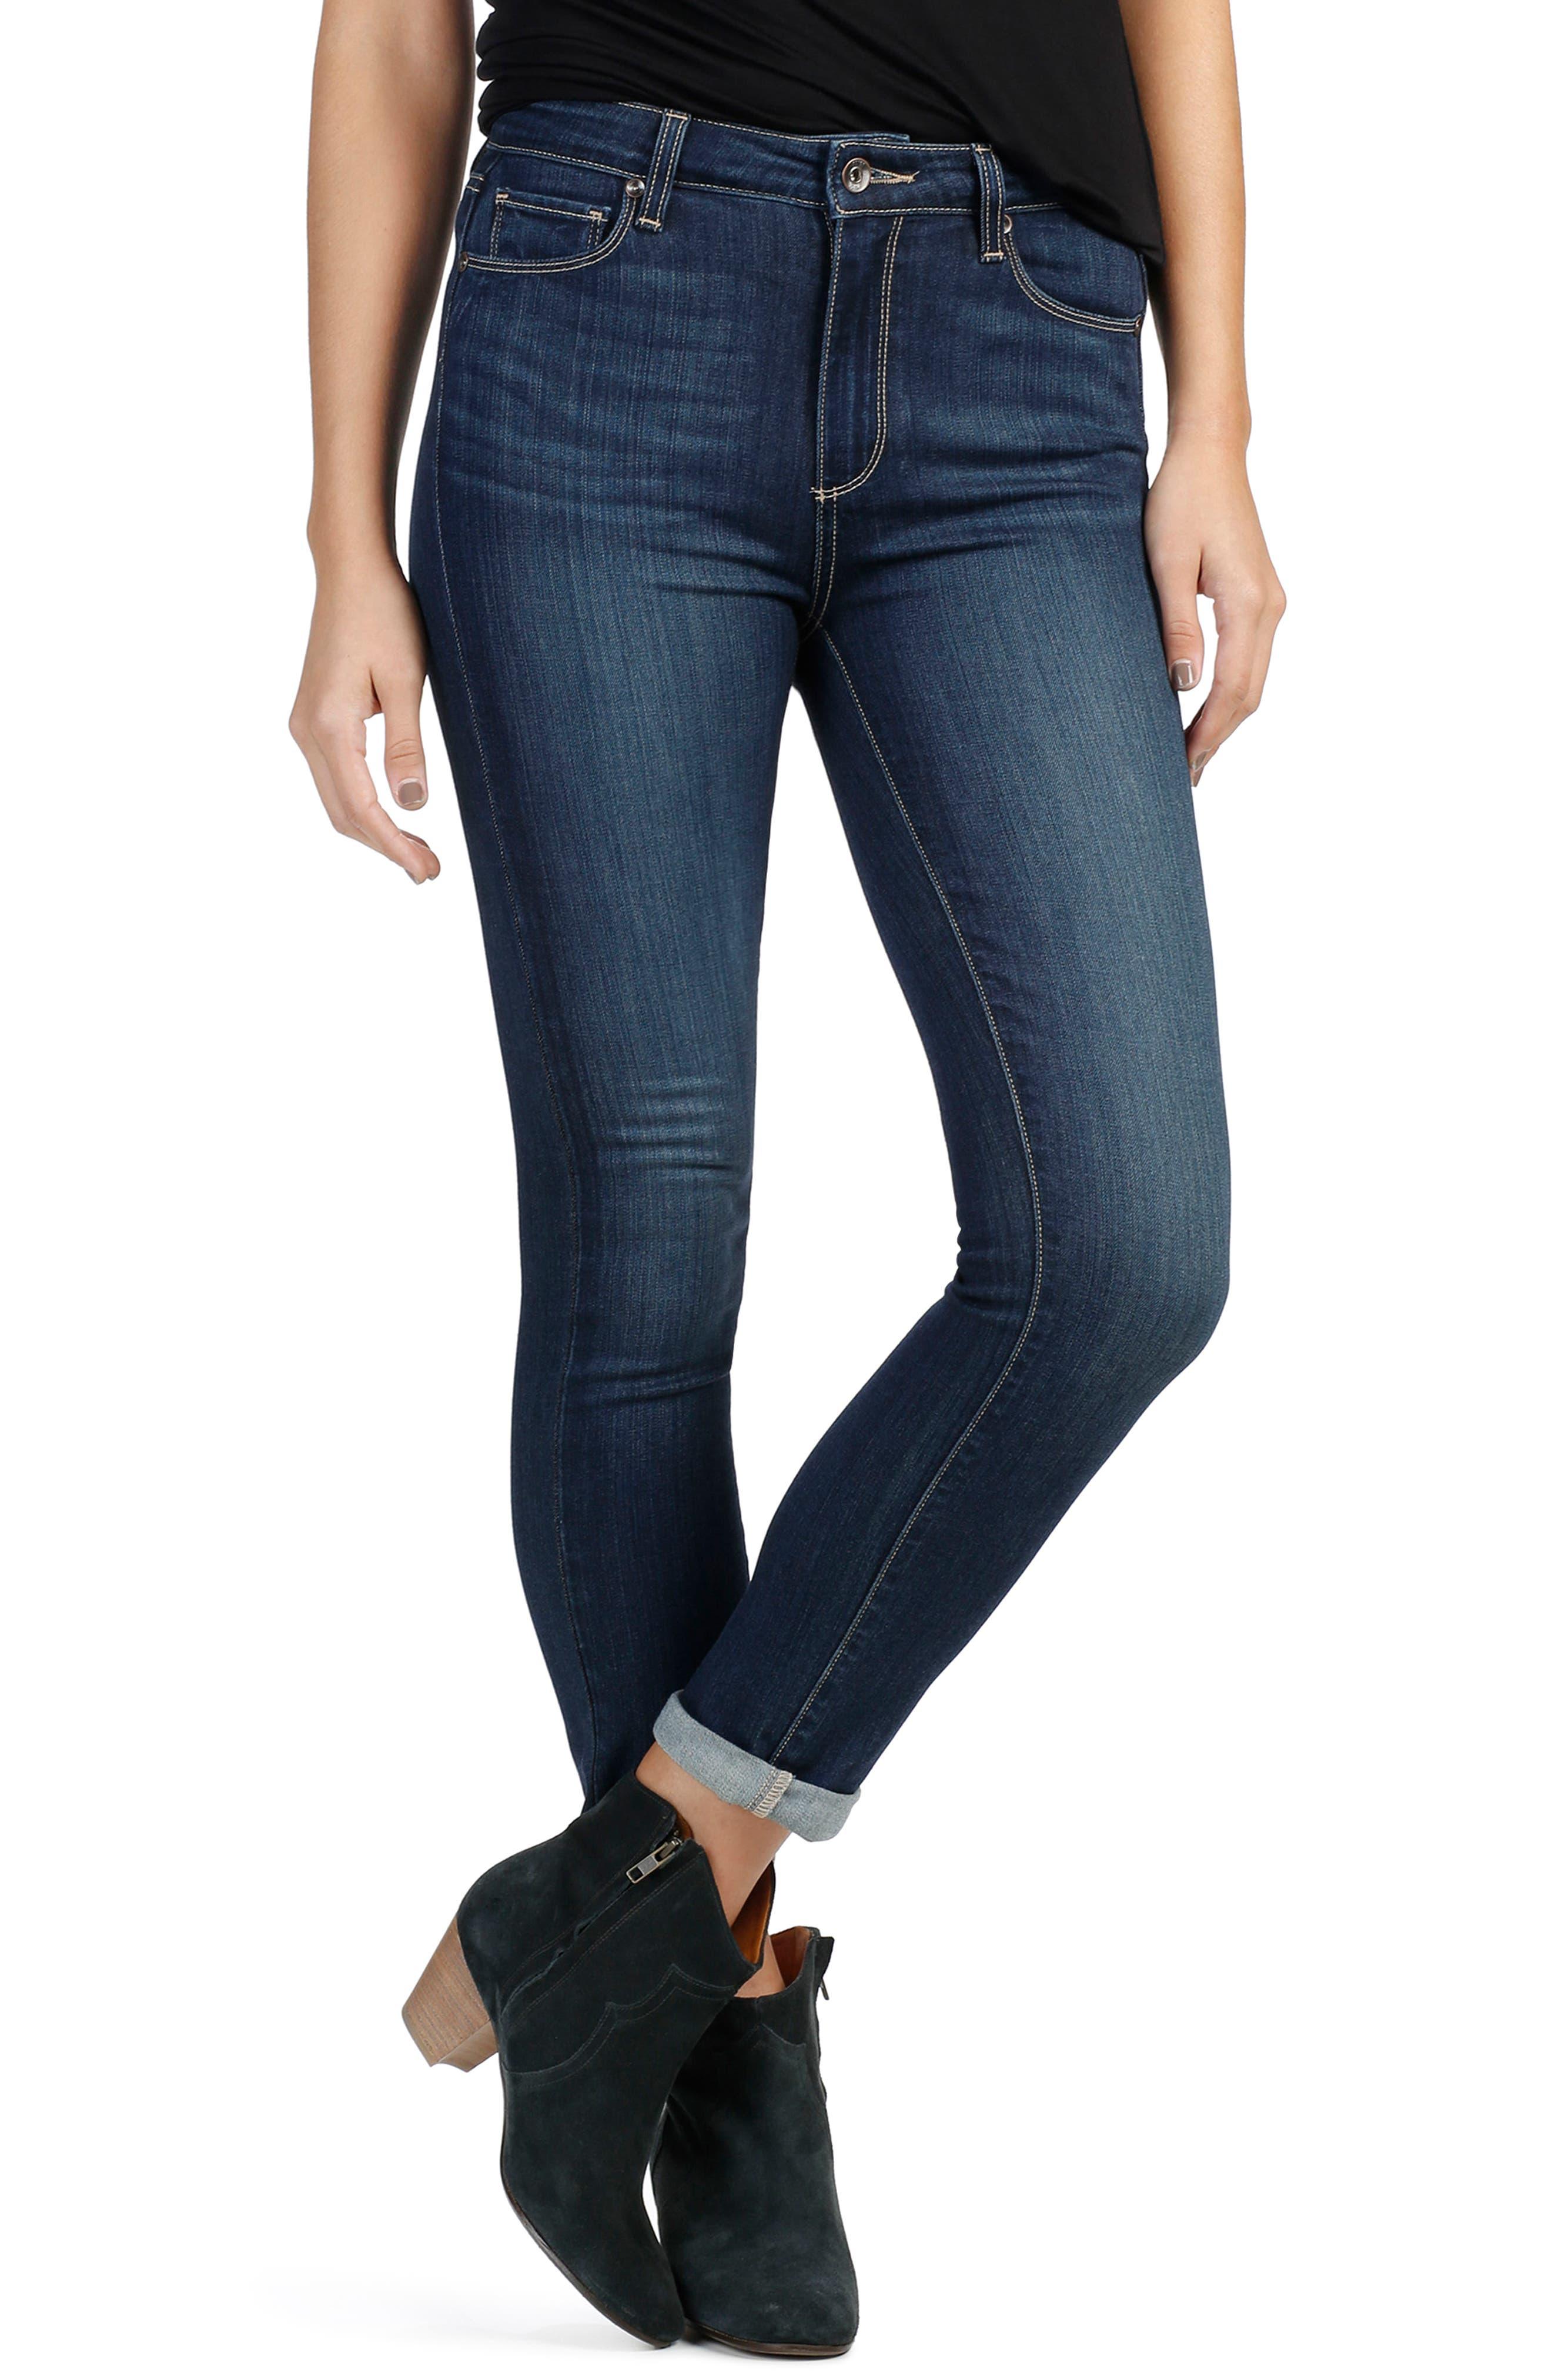 Transcend - Hoxton High Waist Crop Skinny Jeans,                             Main thumbnail 1, color,                             Drift